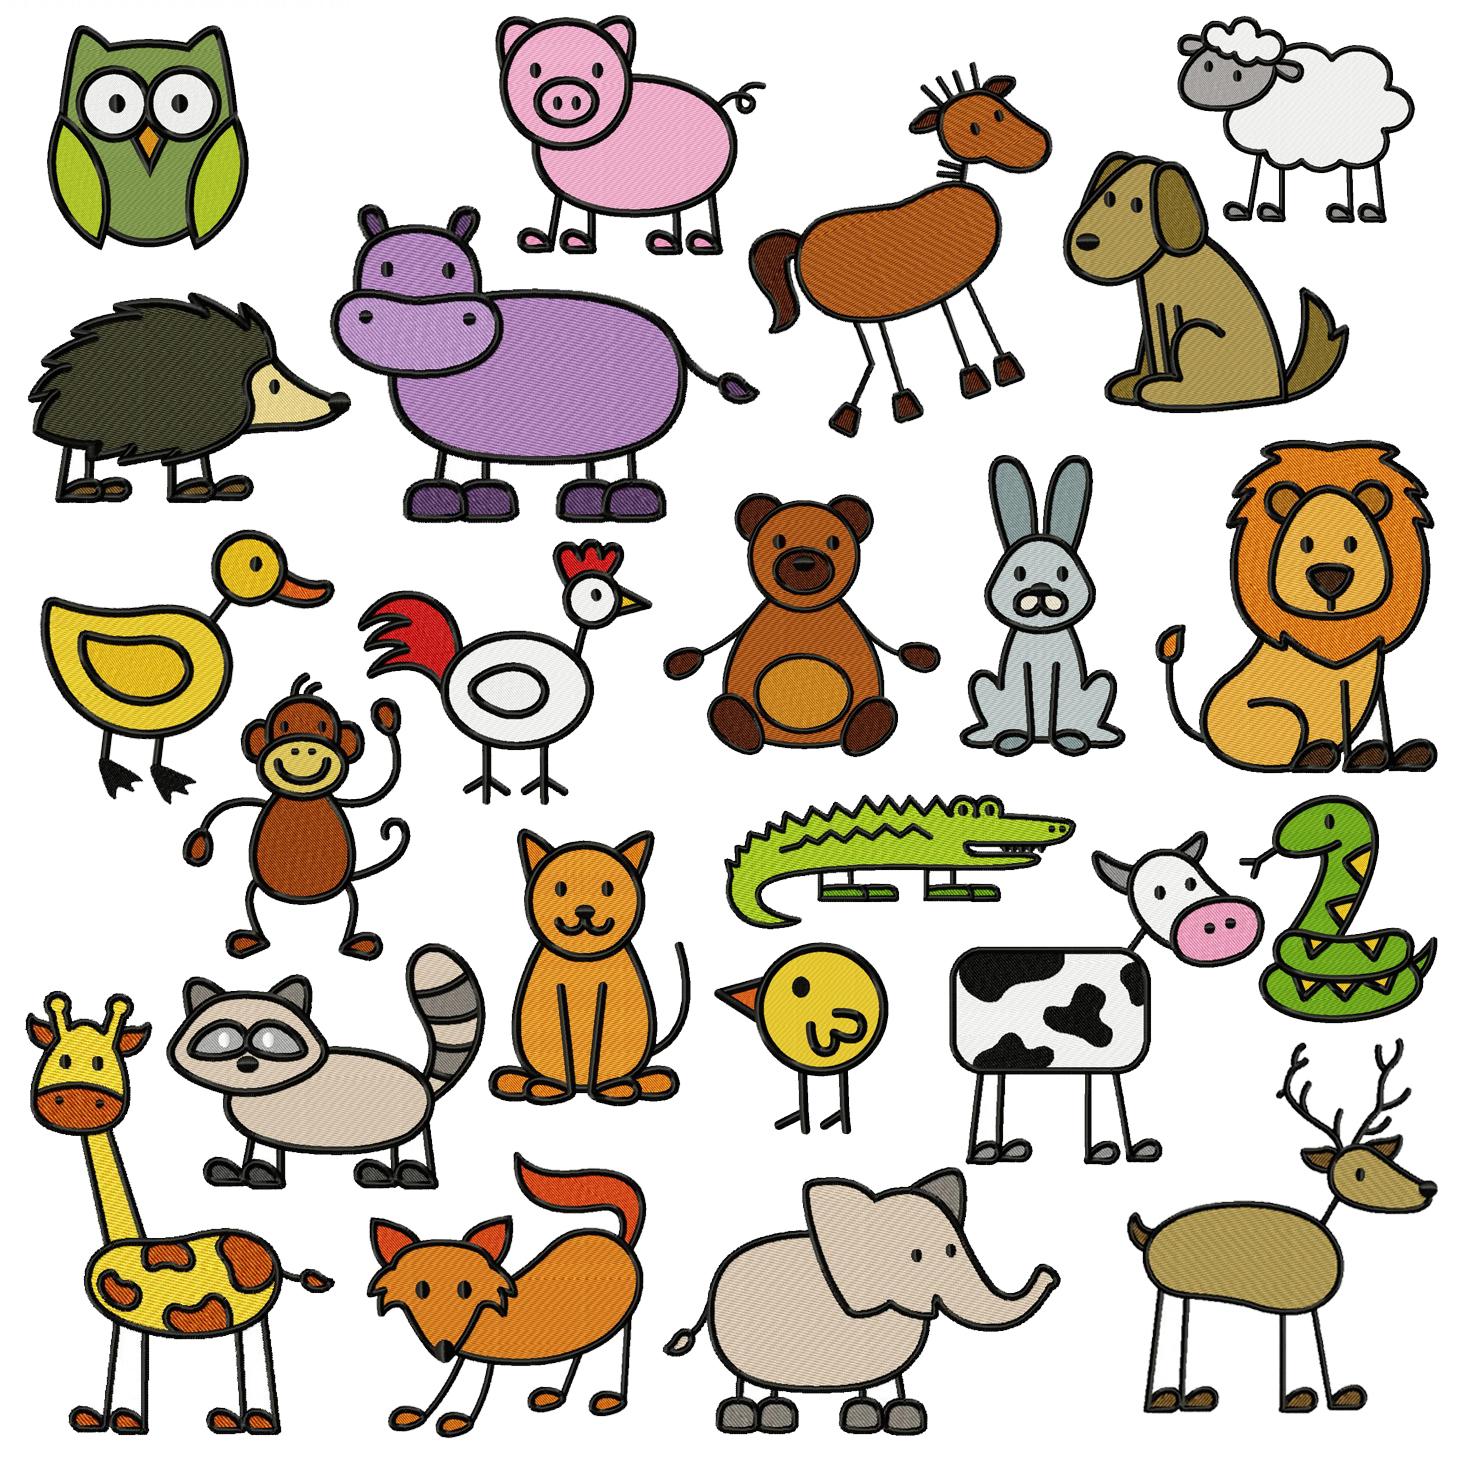 MASSIVE 23 Adorable Stick Animal Embroidery Designs Mega ...